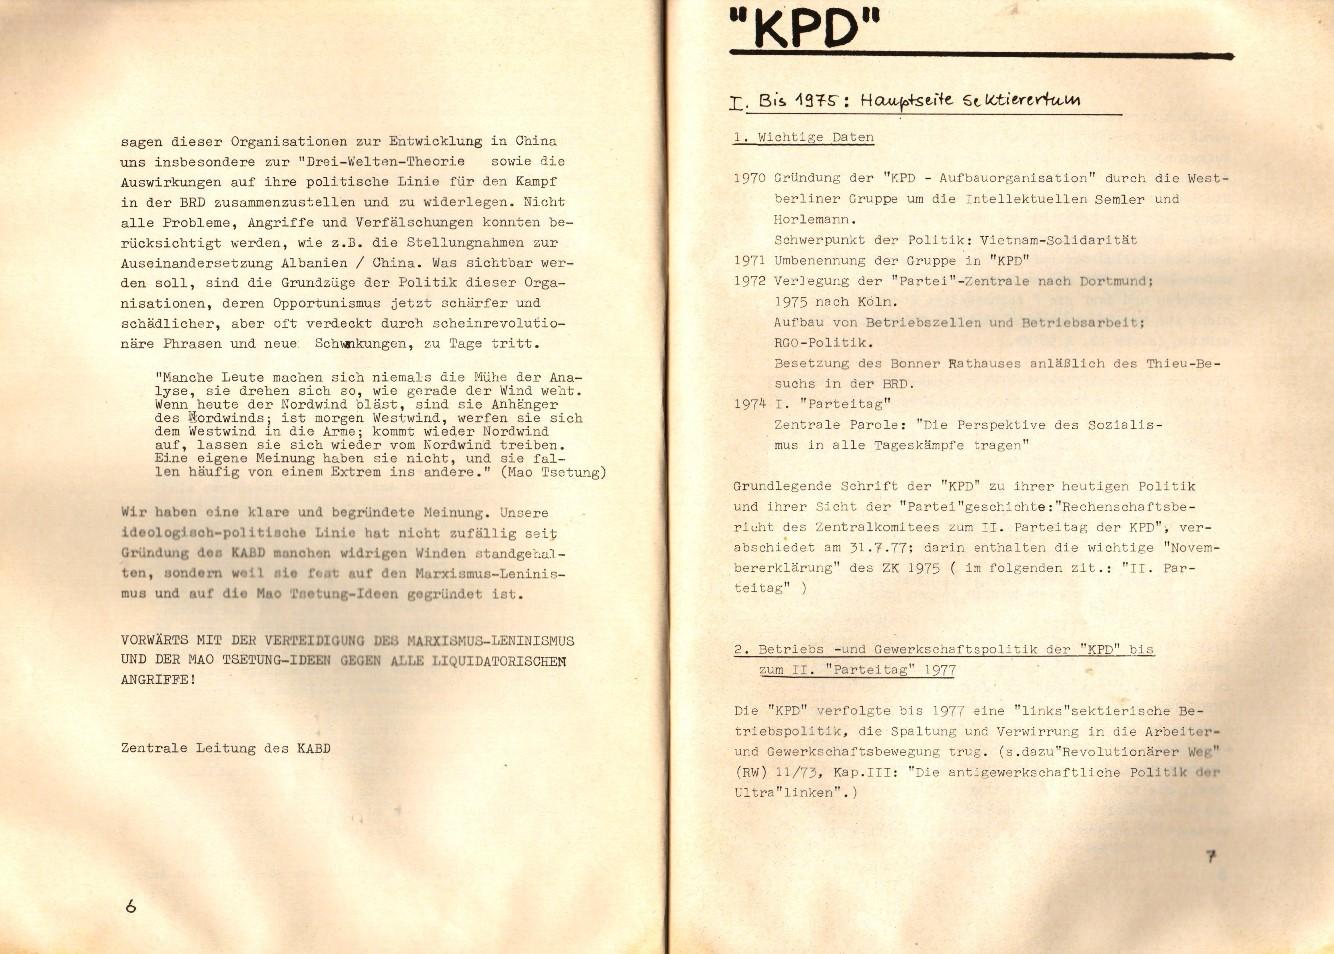 KABD_1978_Argumentationshilfen_05